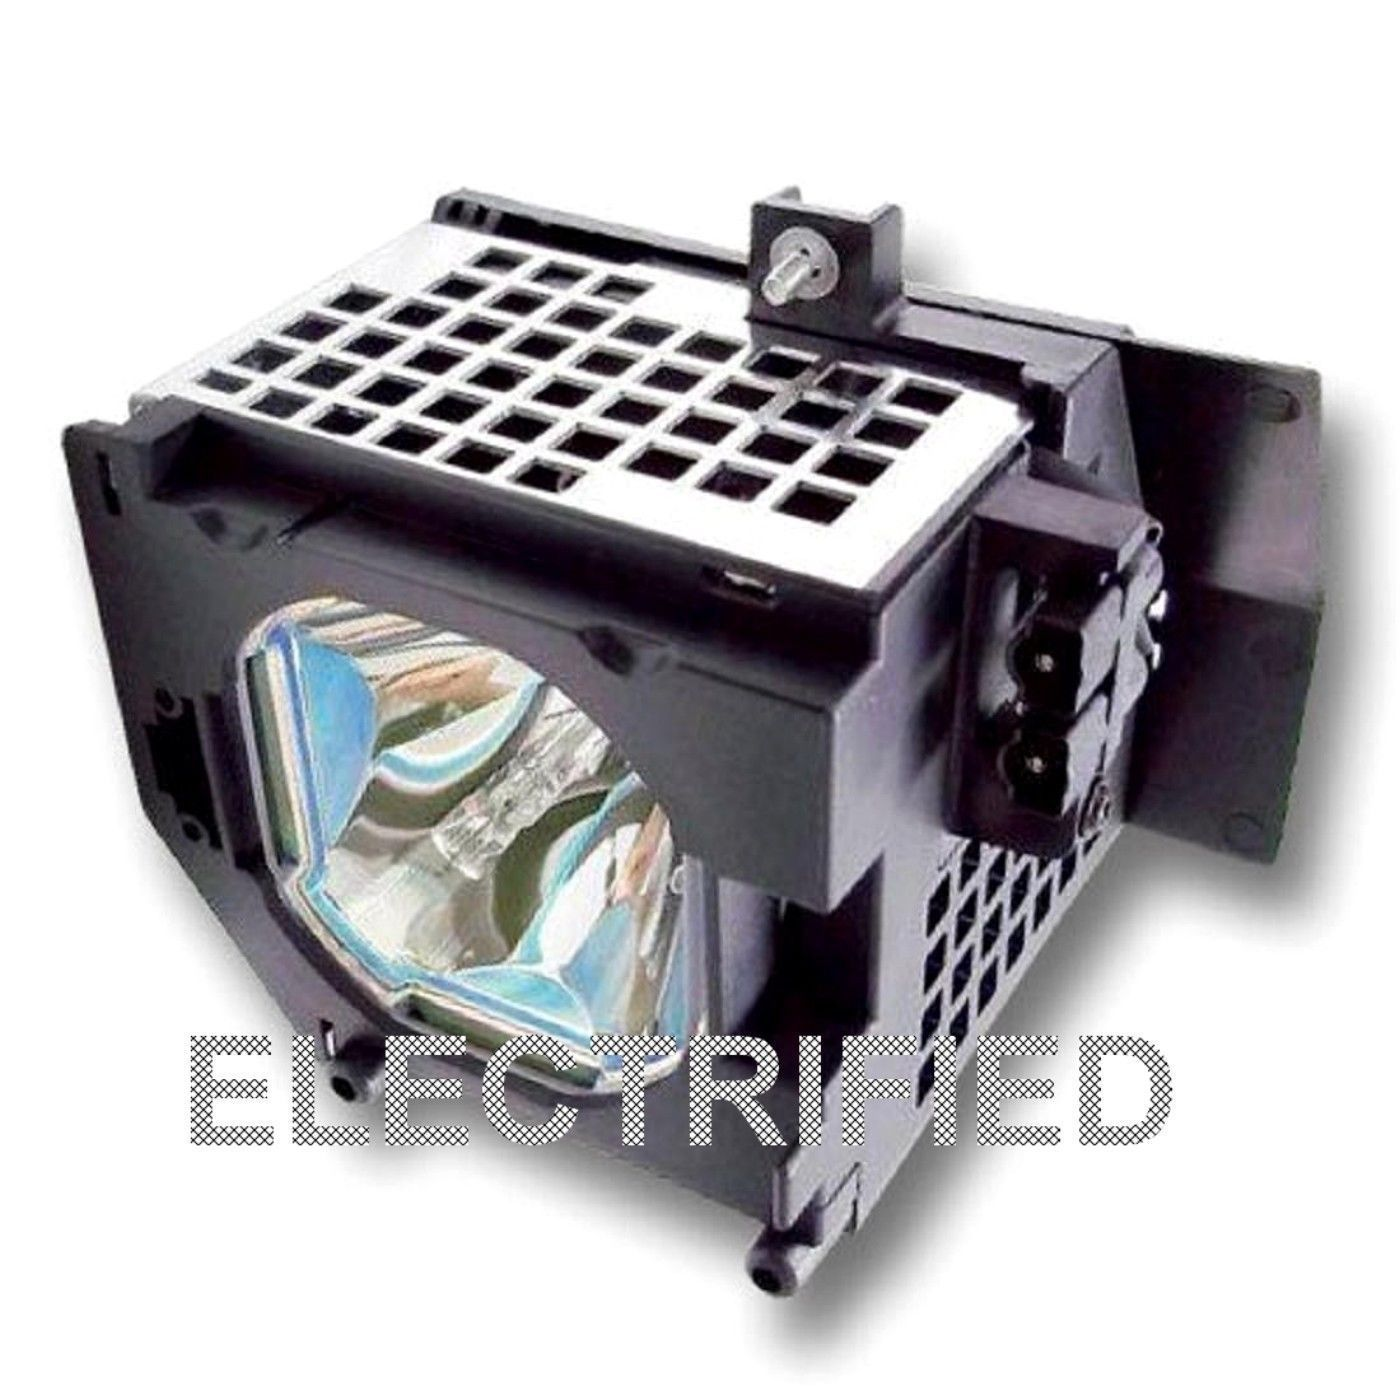 HITACHI UX-21514 UX21514 LM600 LAMP IN HOUSING FOR TELEVISION MODEL 60VS810